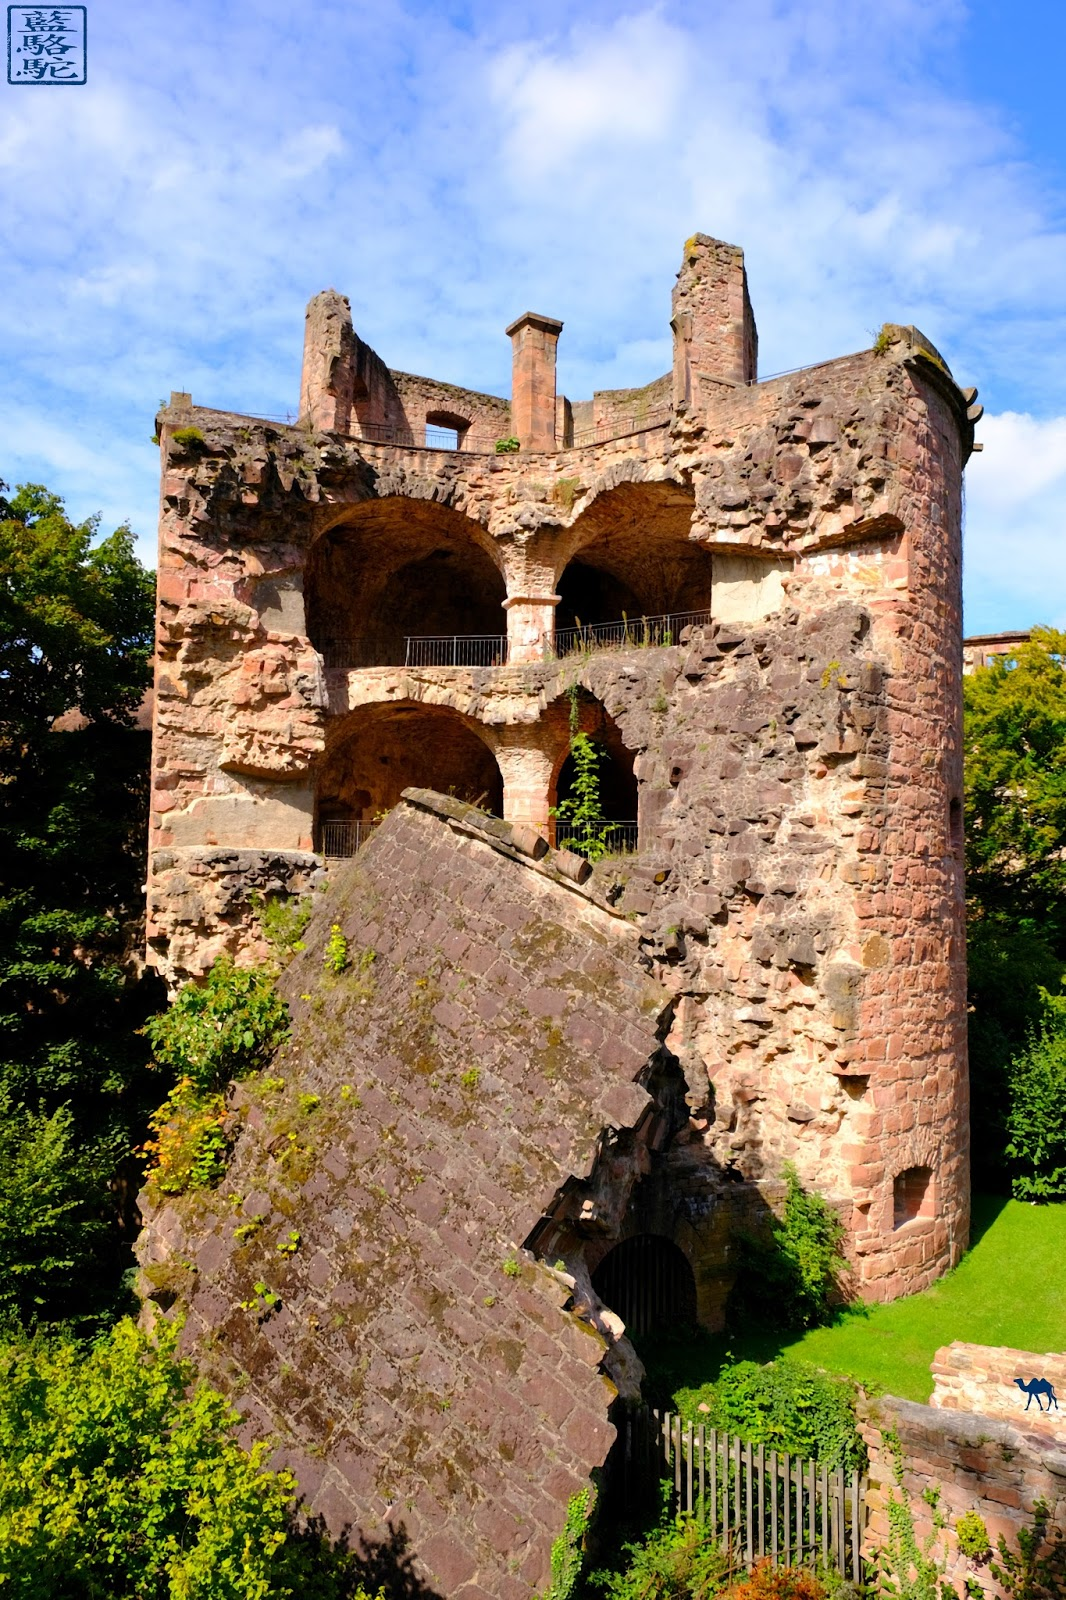 Le Chameau Bleu - Blog Voyage Heildeberg Allemagne - Chateau Heidelberg - Tour